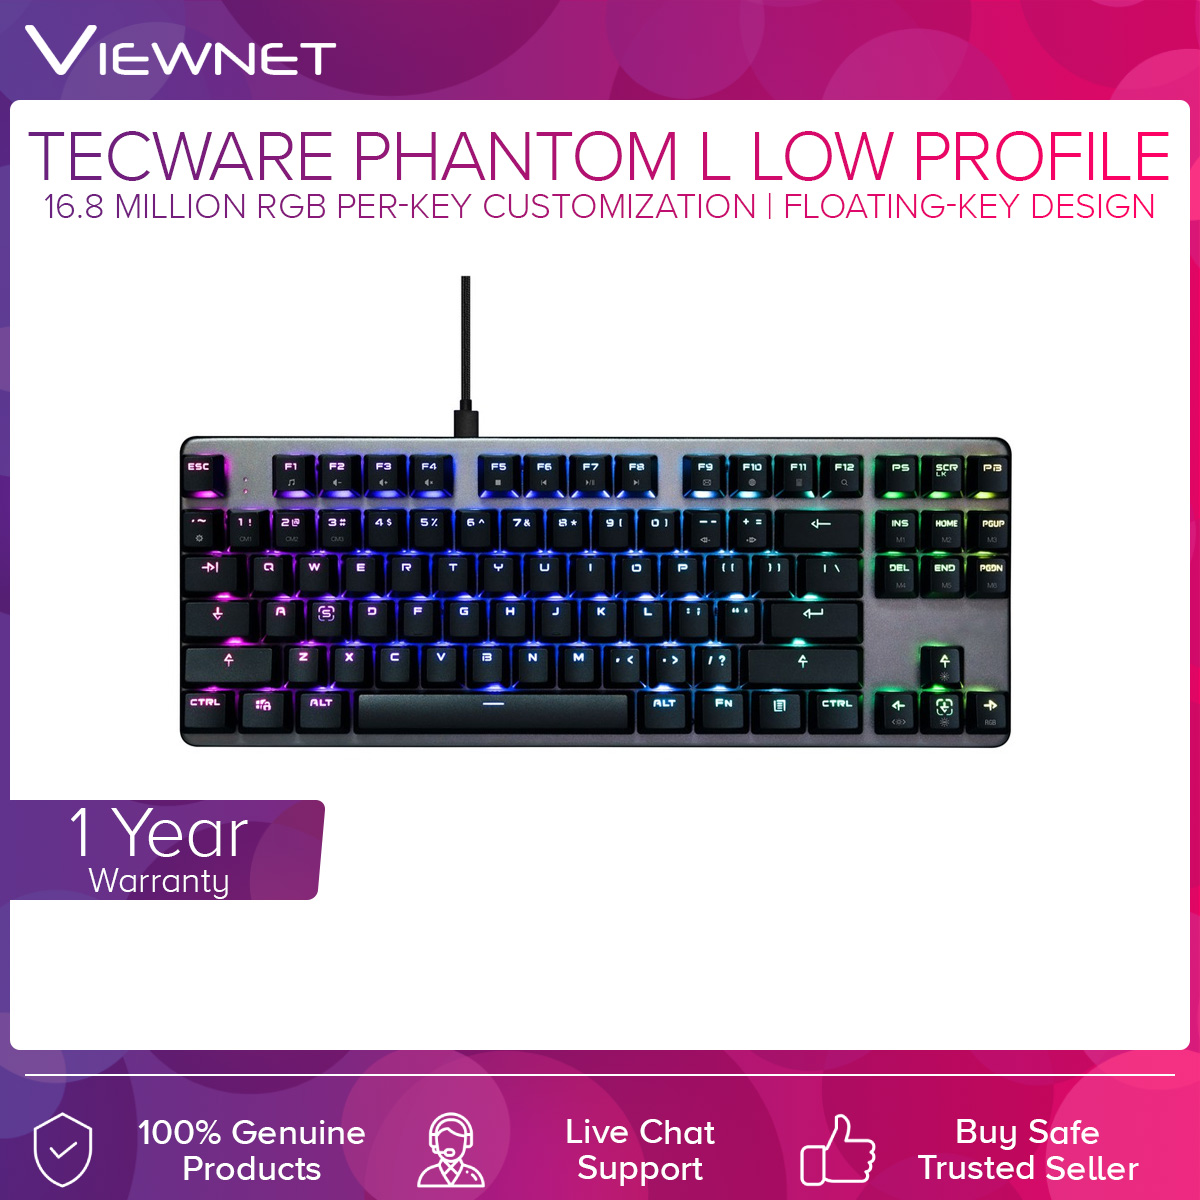 Tecware Phantom L Low Profile Wired Mechanical RGB Blue/Brown/Red Switch Keyboard (TW-KB-PL-ZOBL/TW-KB-PL-ZOBR/TW-KB-PL-ZORD)